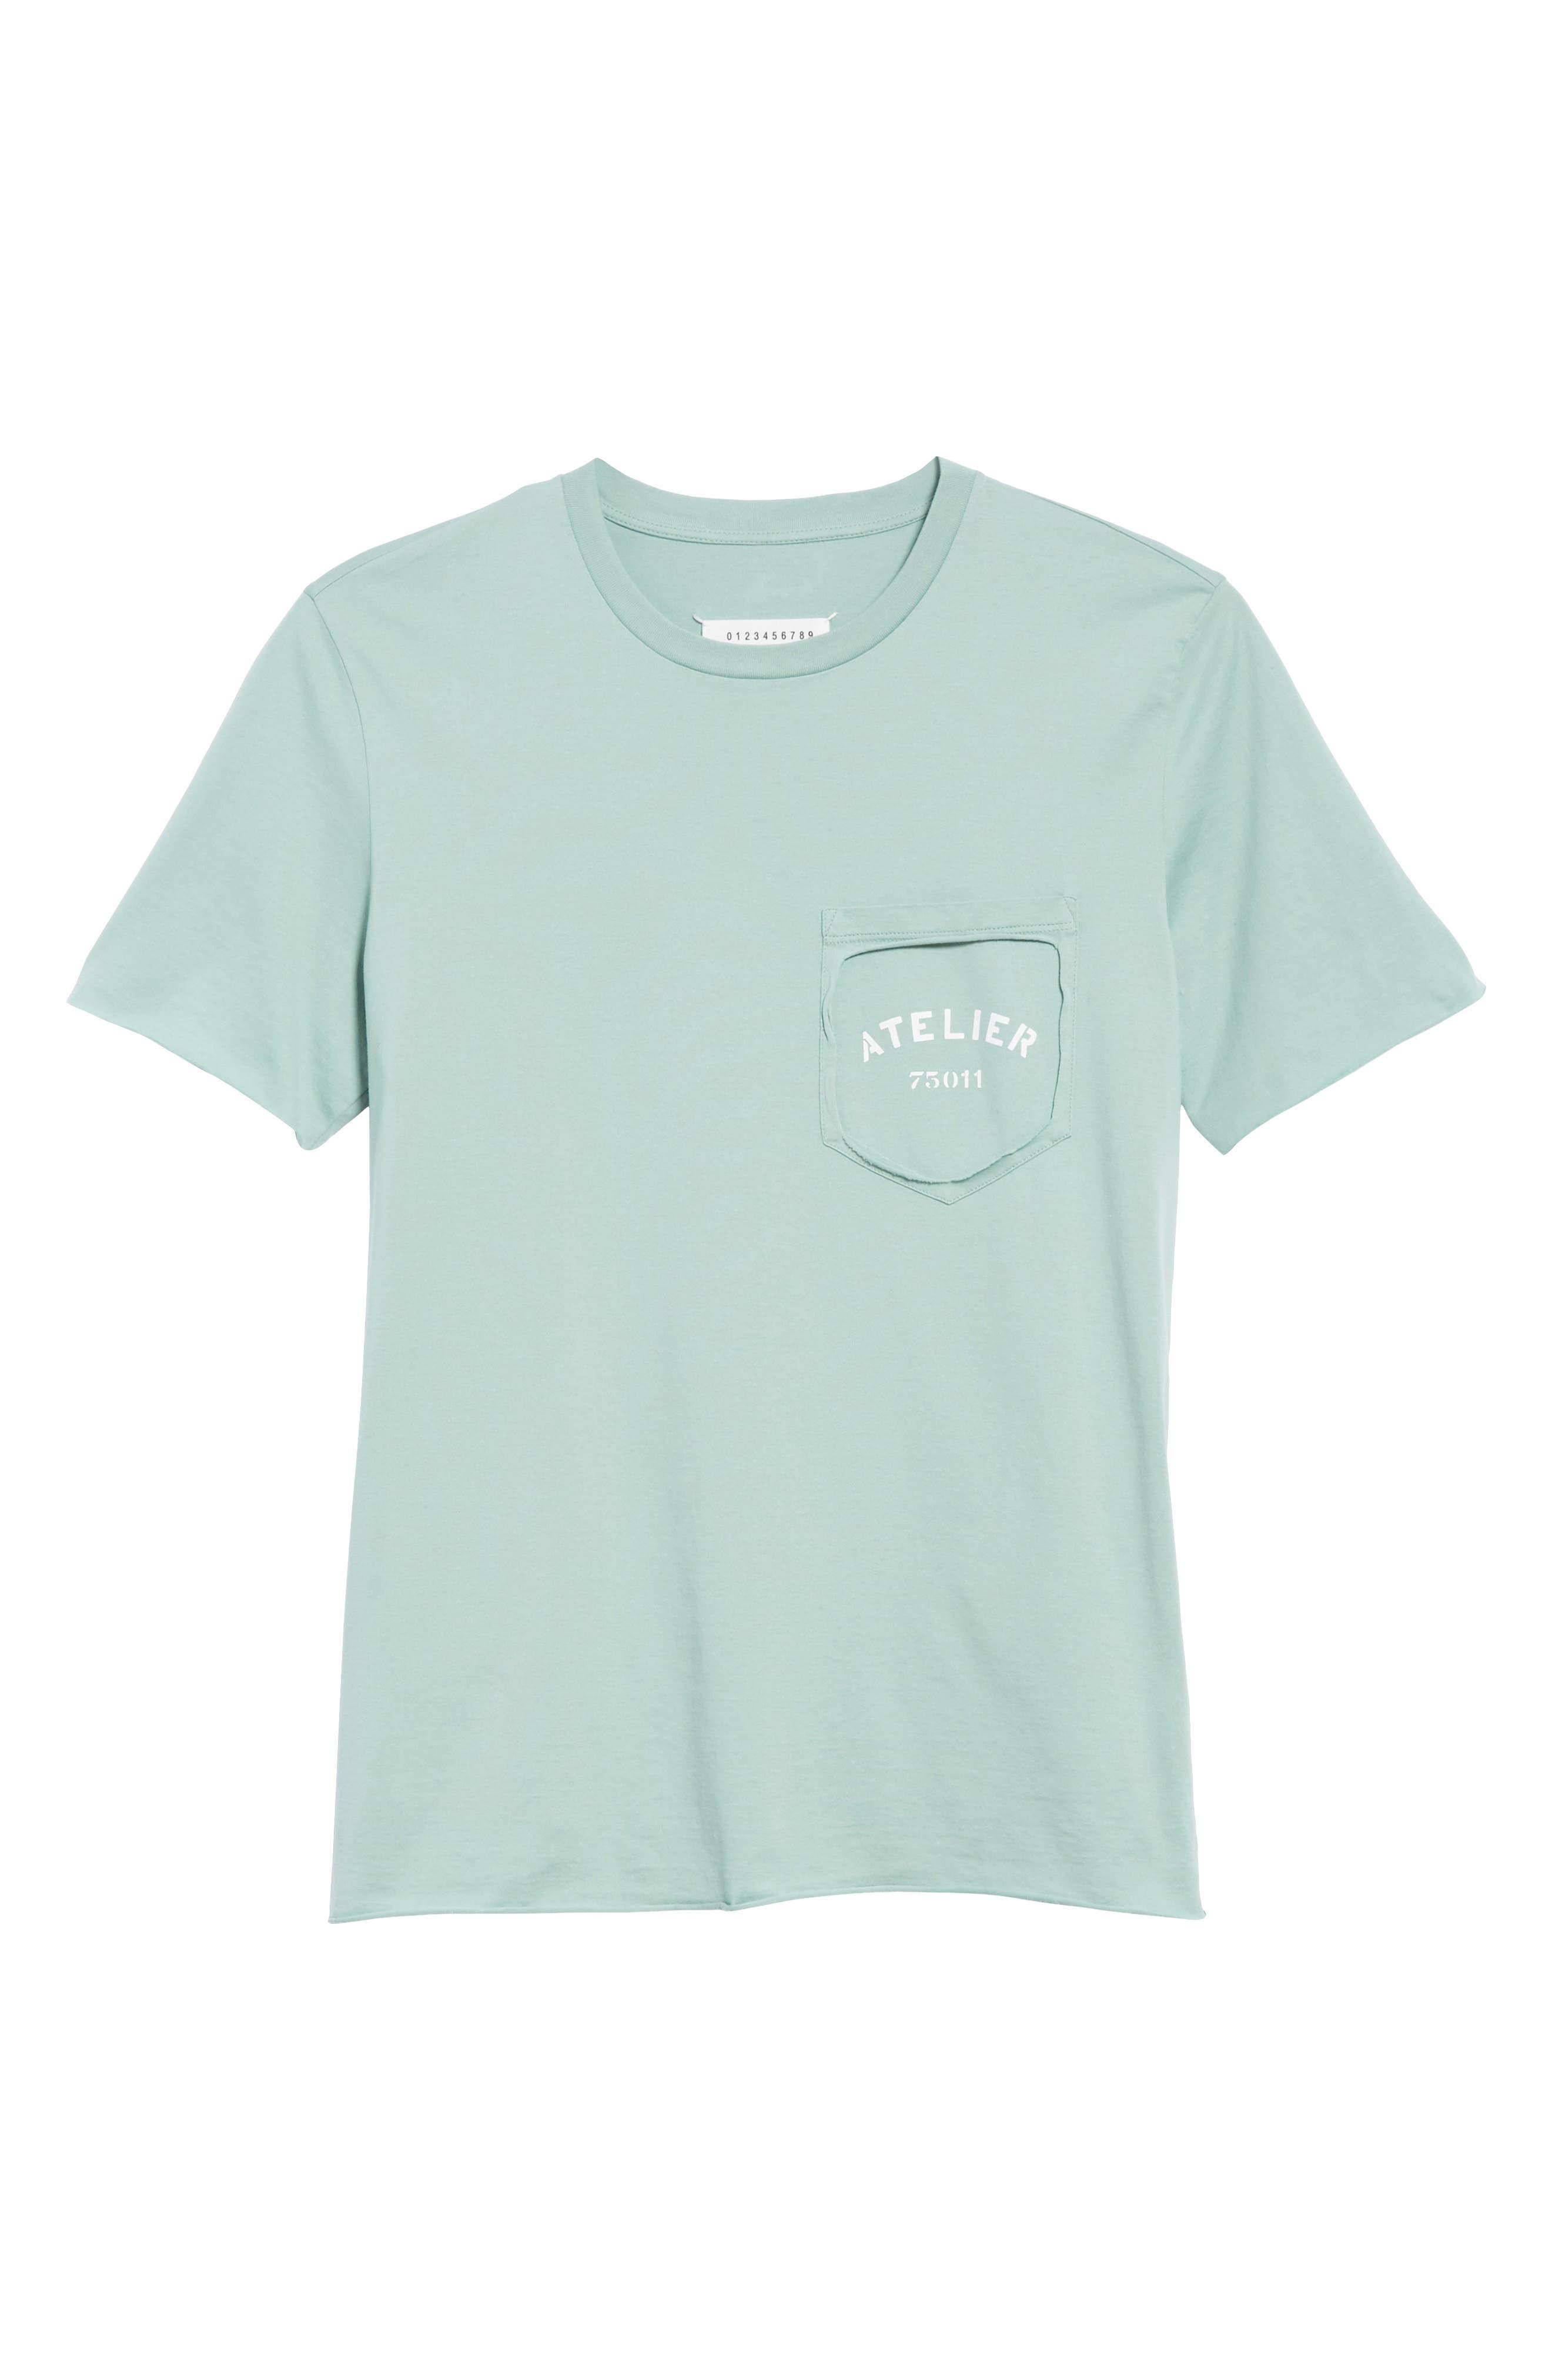 Missing Pocket T-Shirt,                             Alternate thumbnail 6, color,                             330